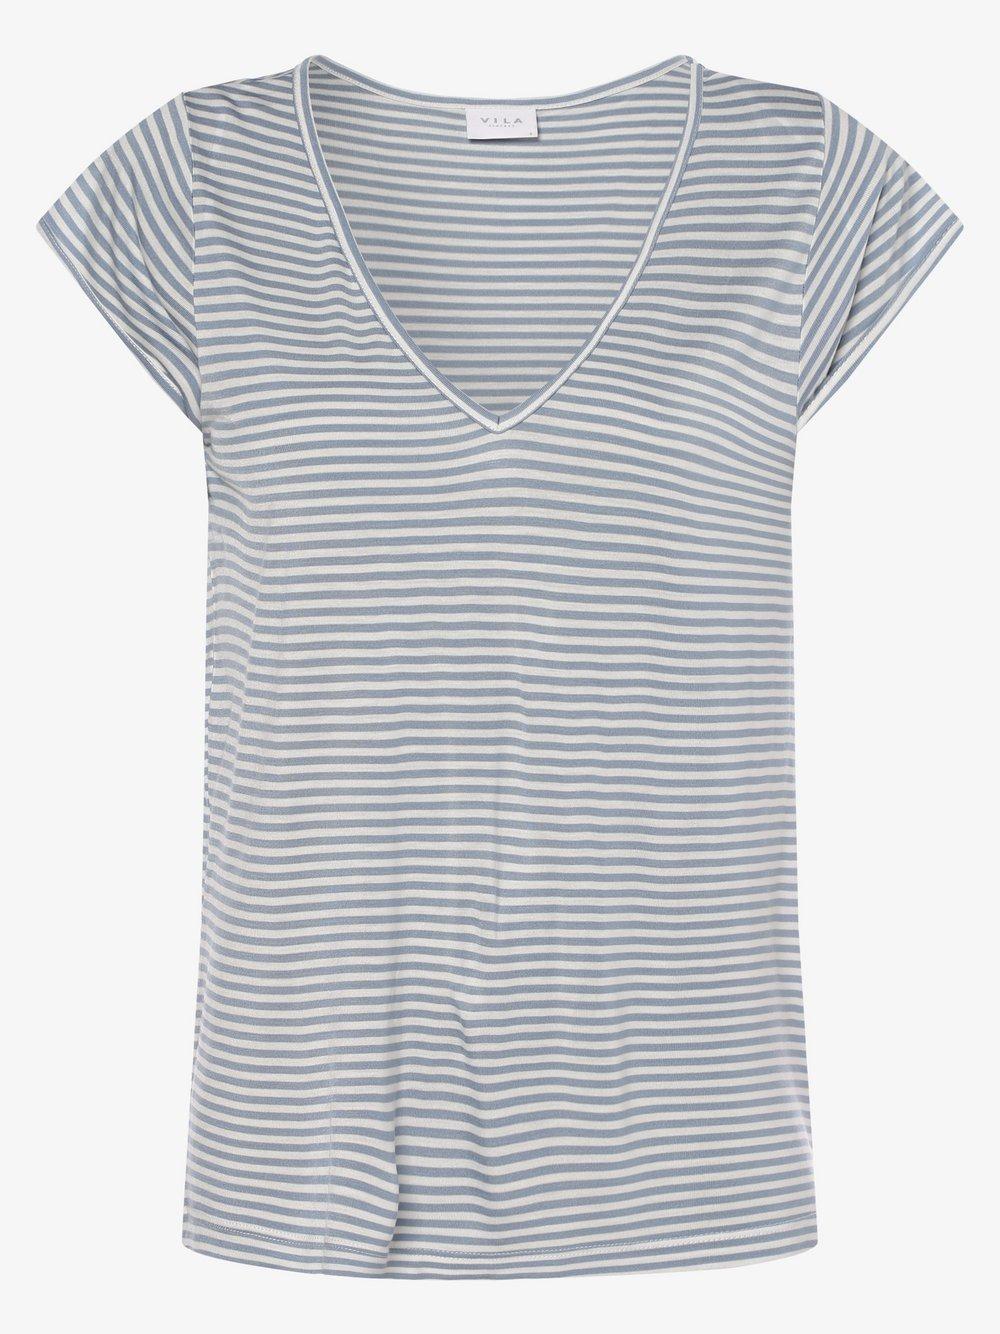 Vila - T-shirt damski – Viscoop, niebieski